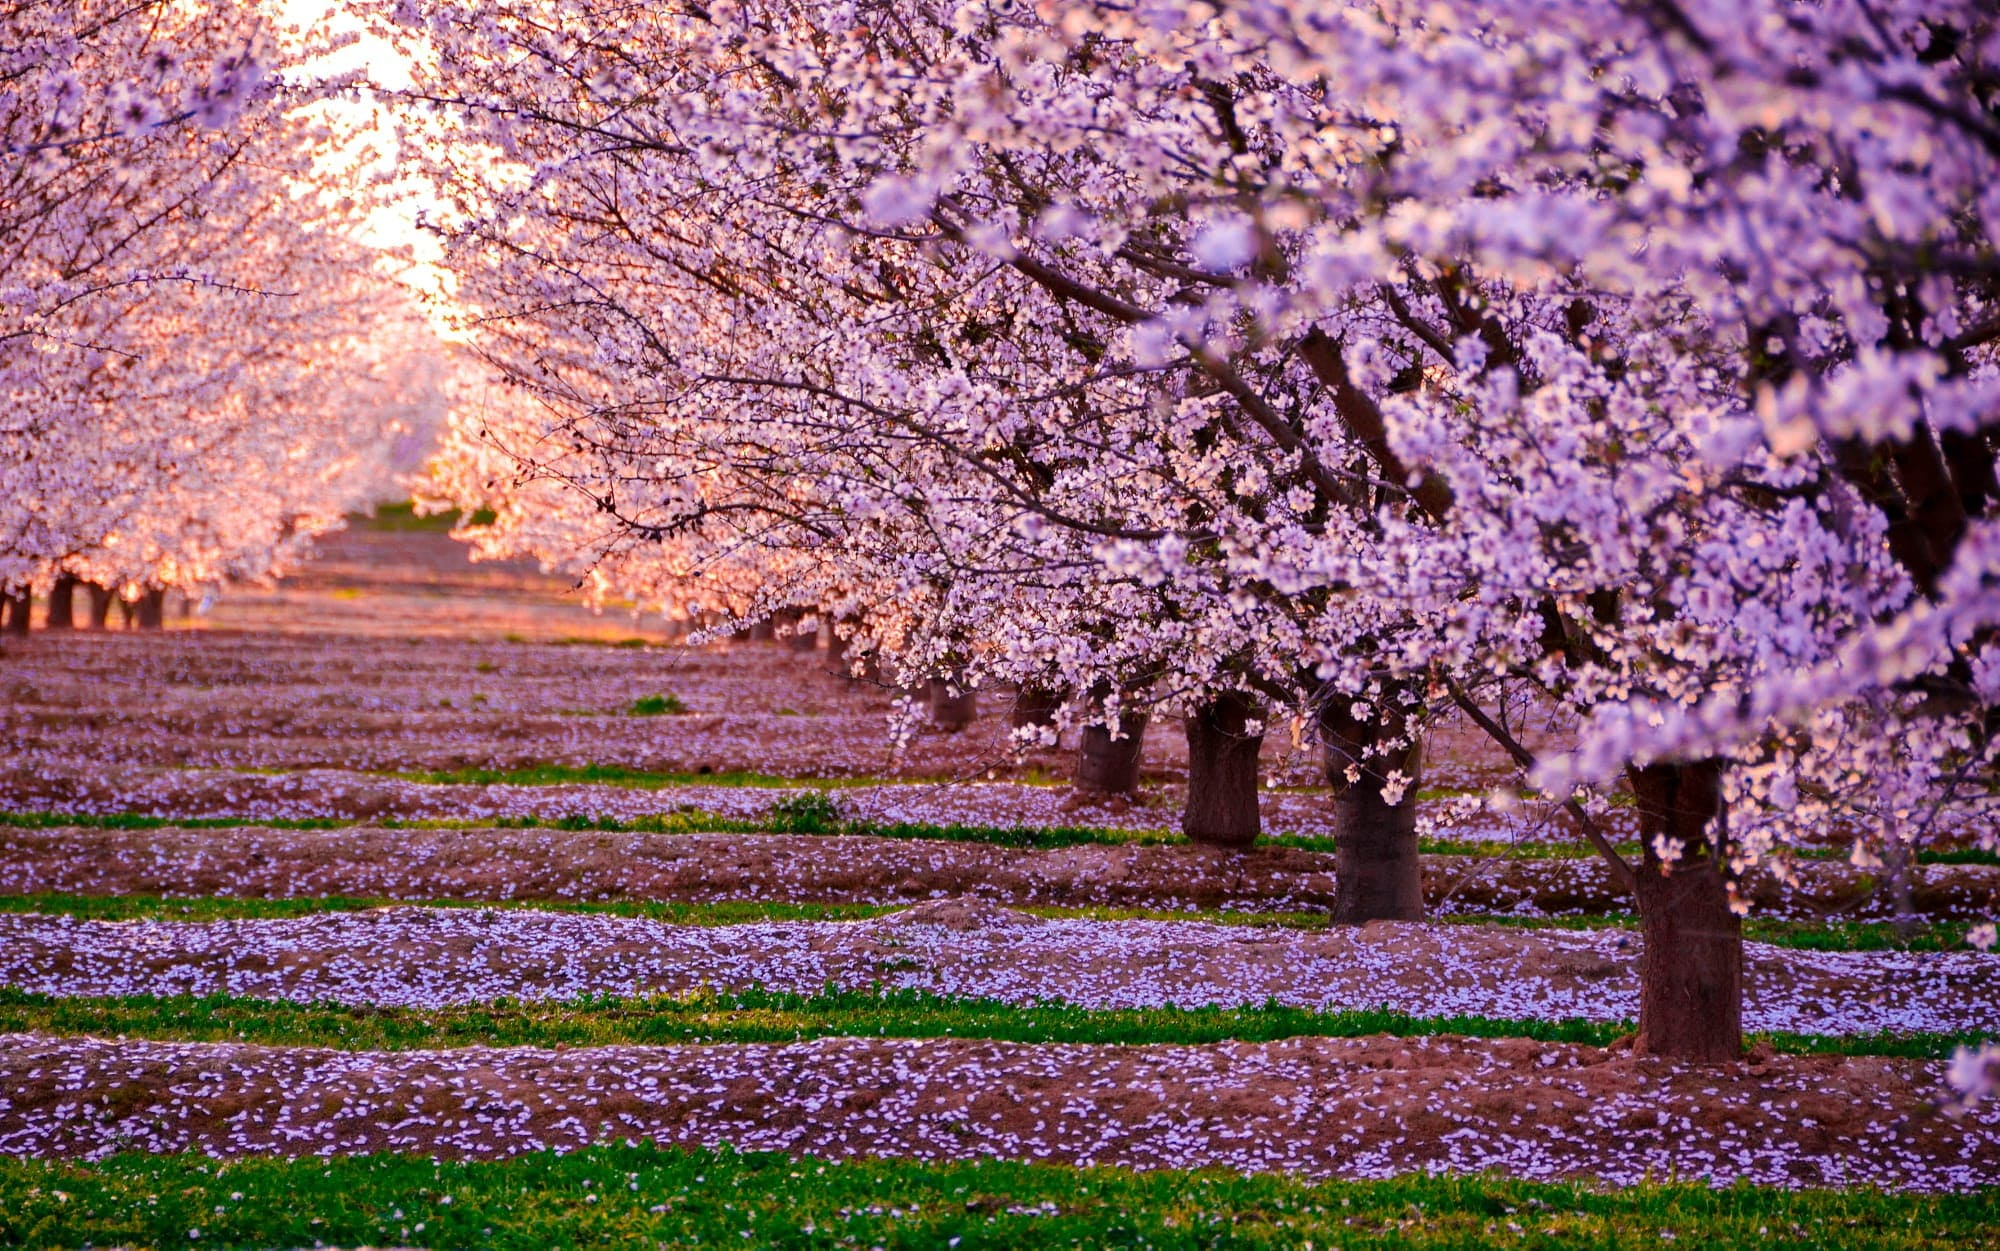 Cherry Blossom Hd Wallpaper - KoLPaPer - Awesome Free HD ...